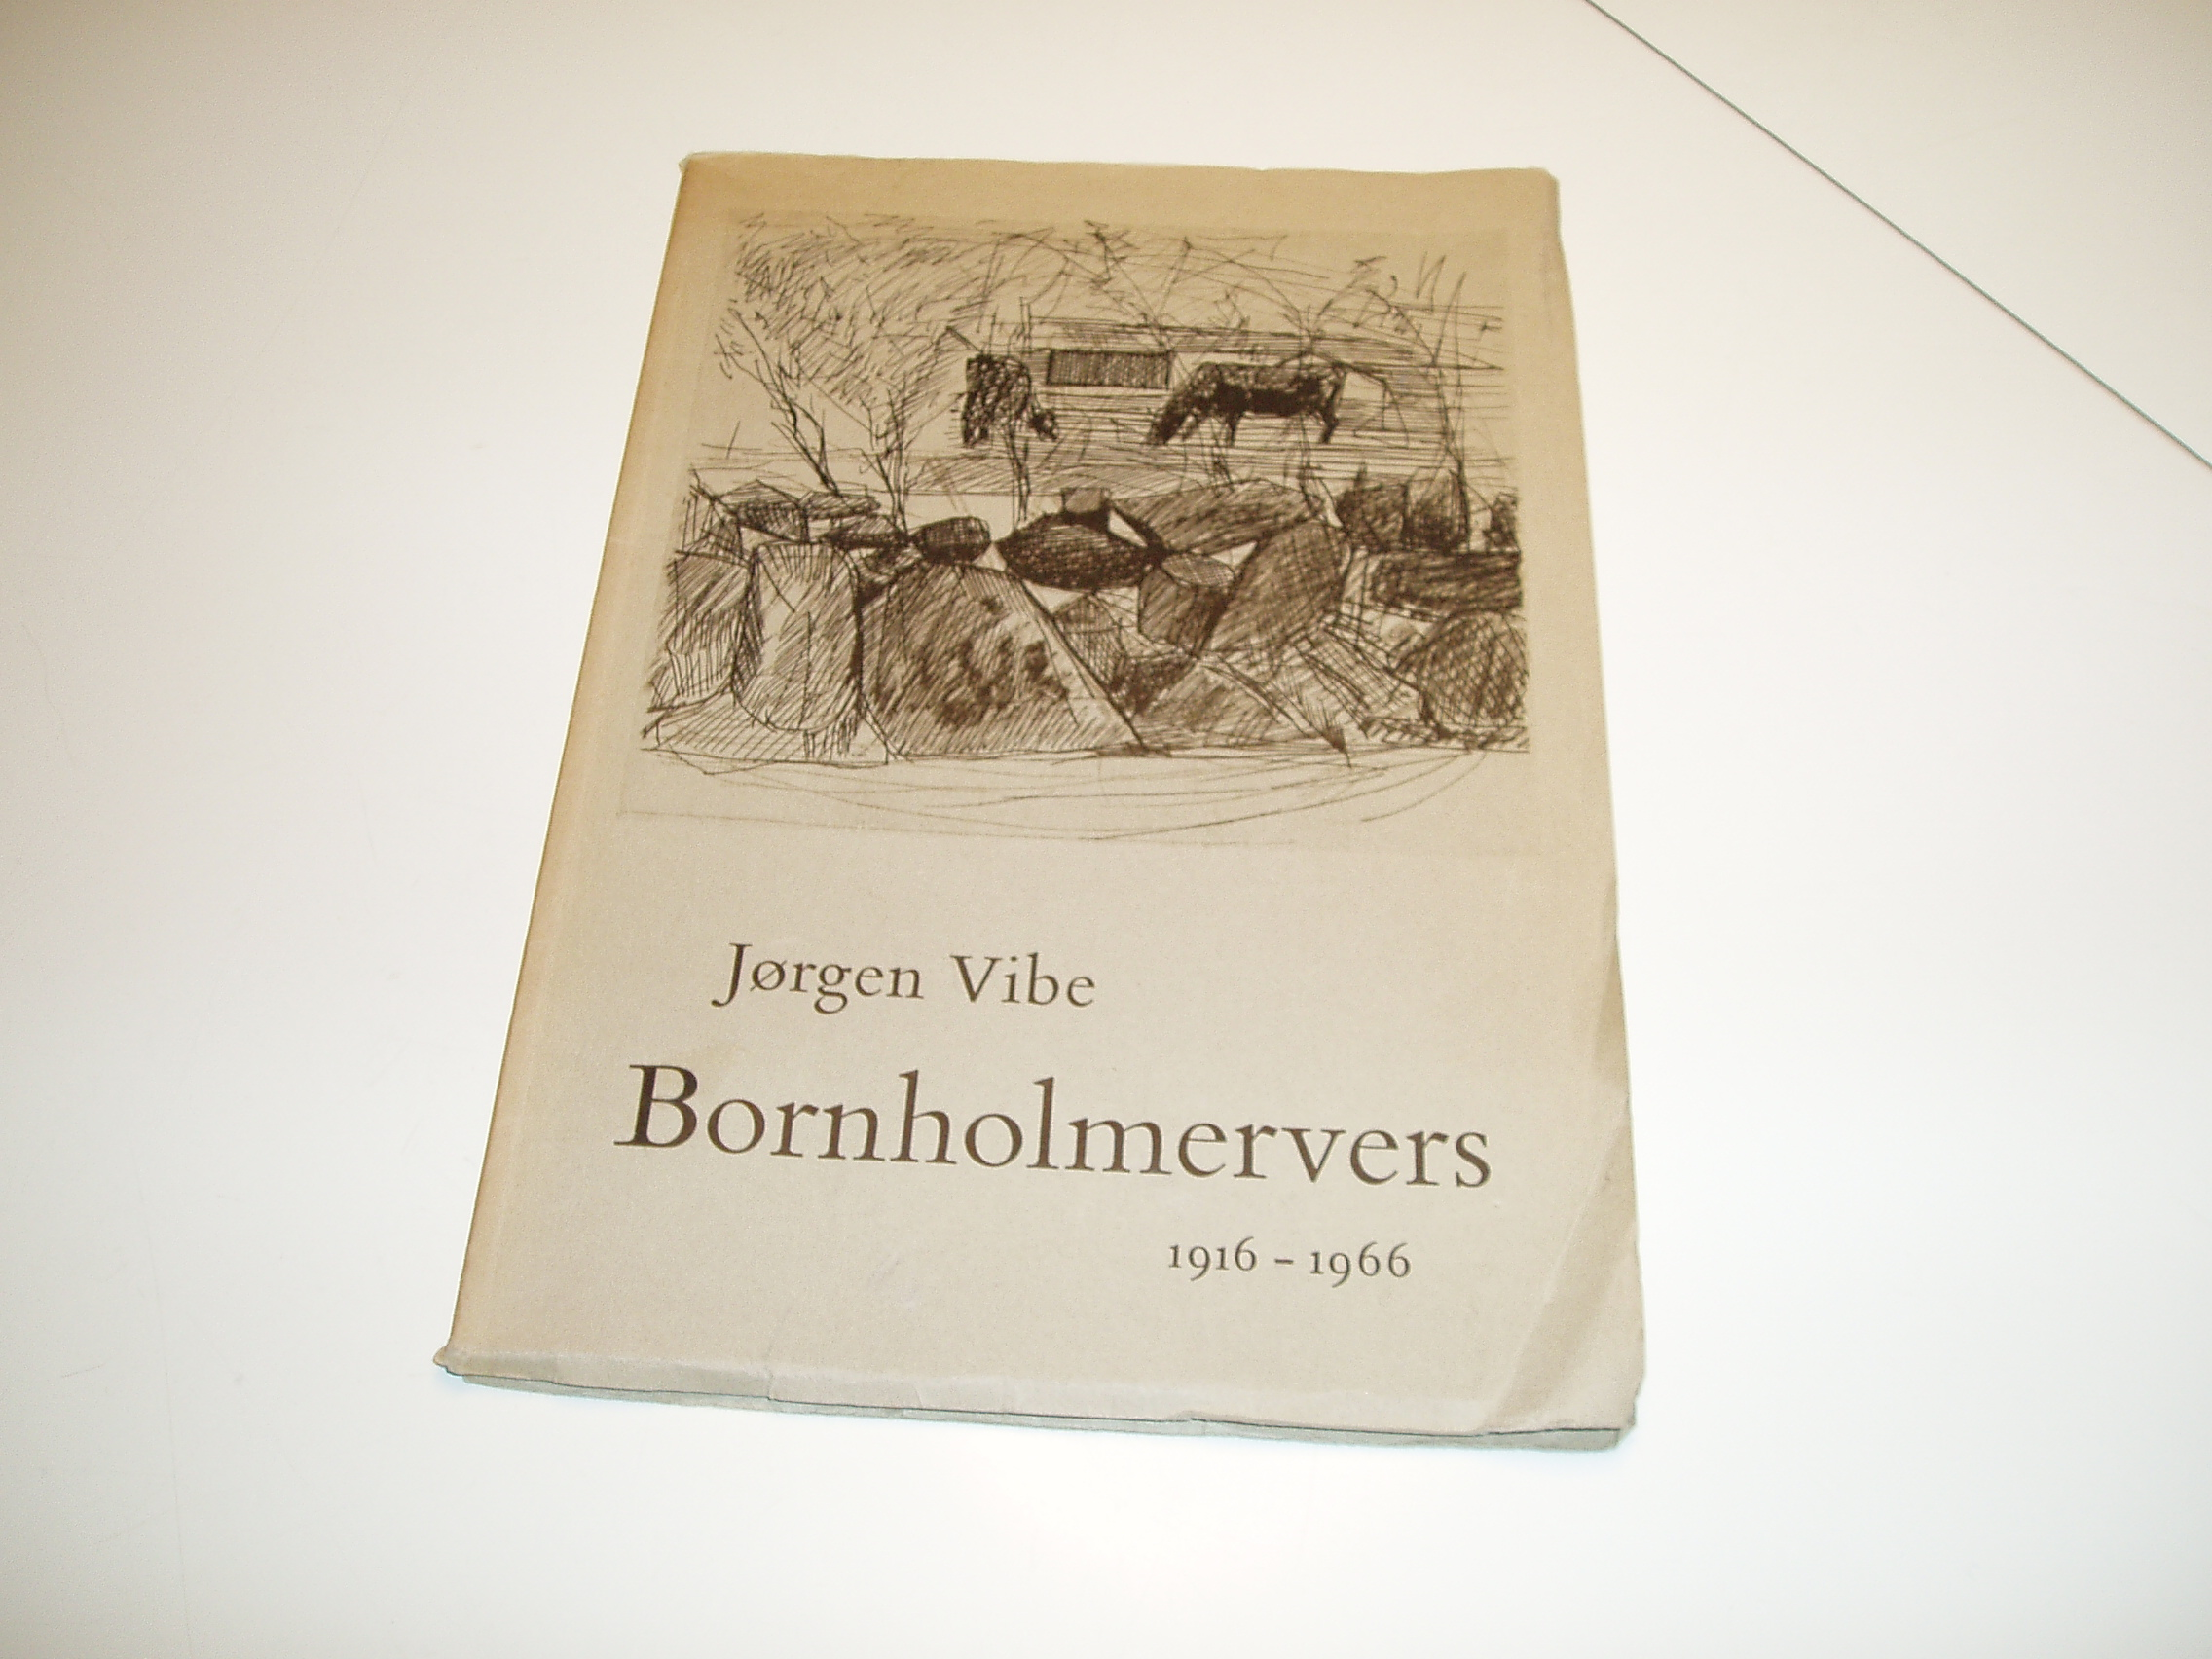 Bornholmervers 1916-1966